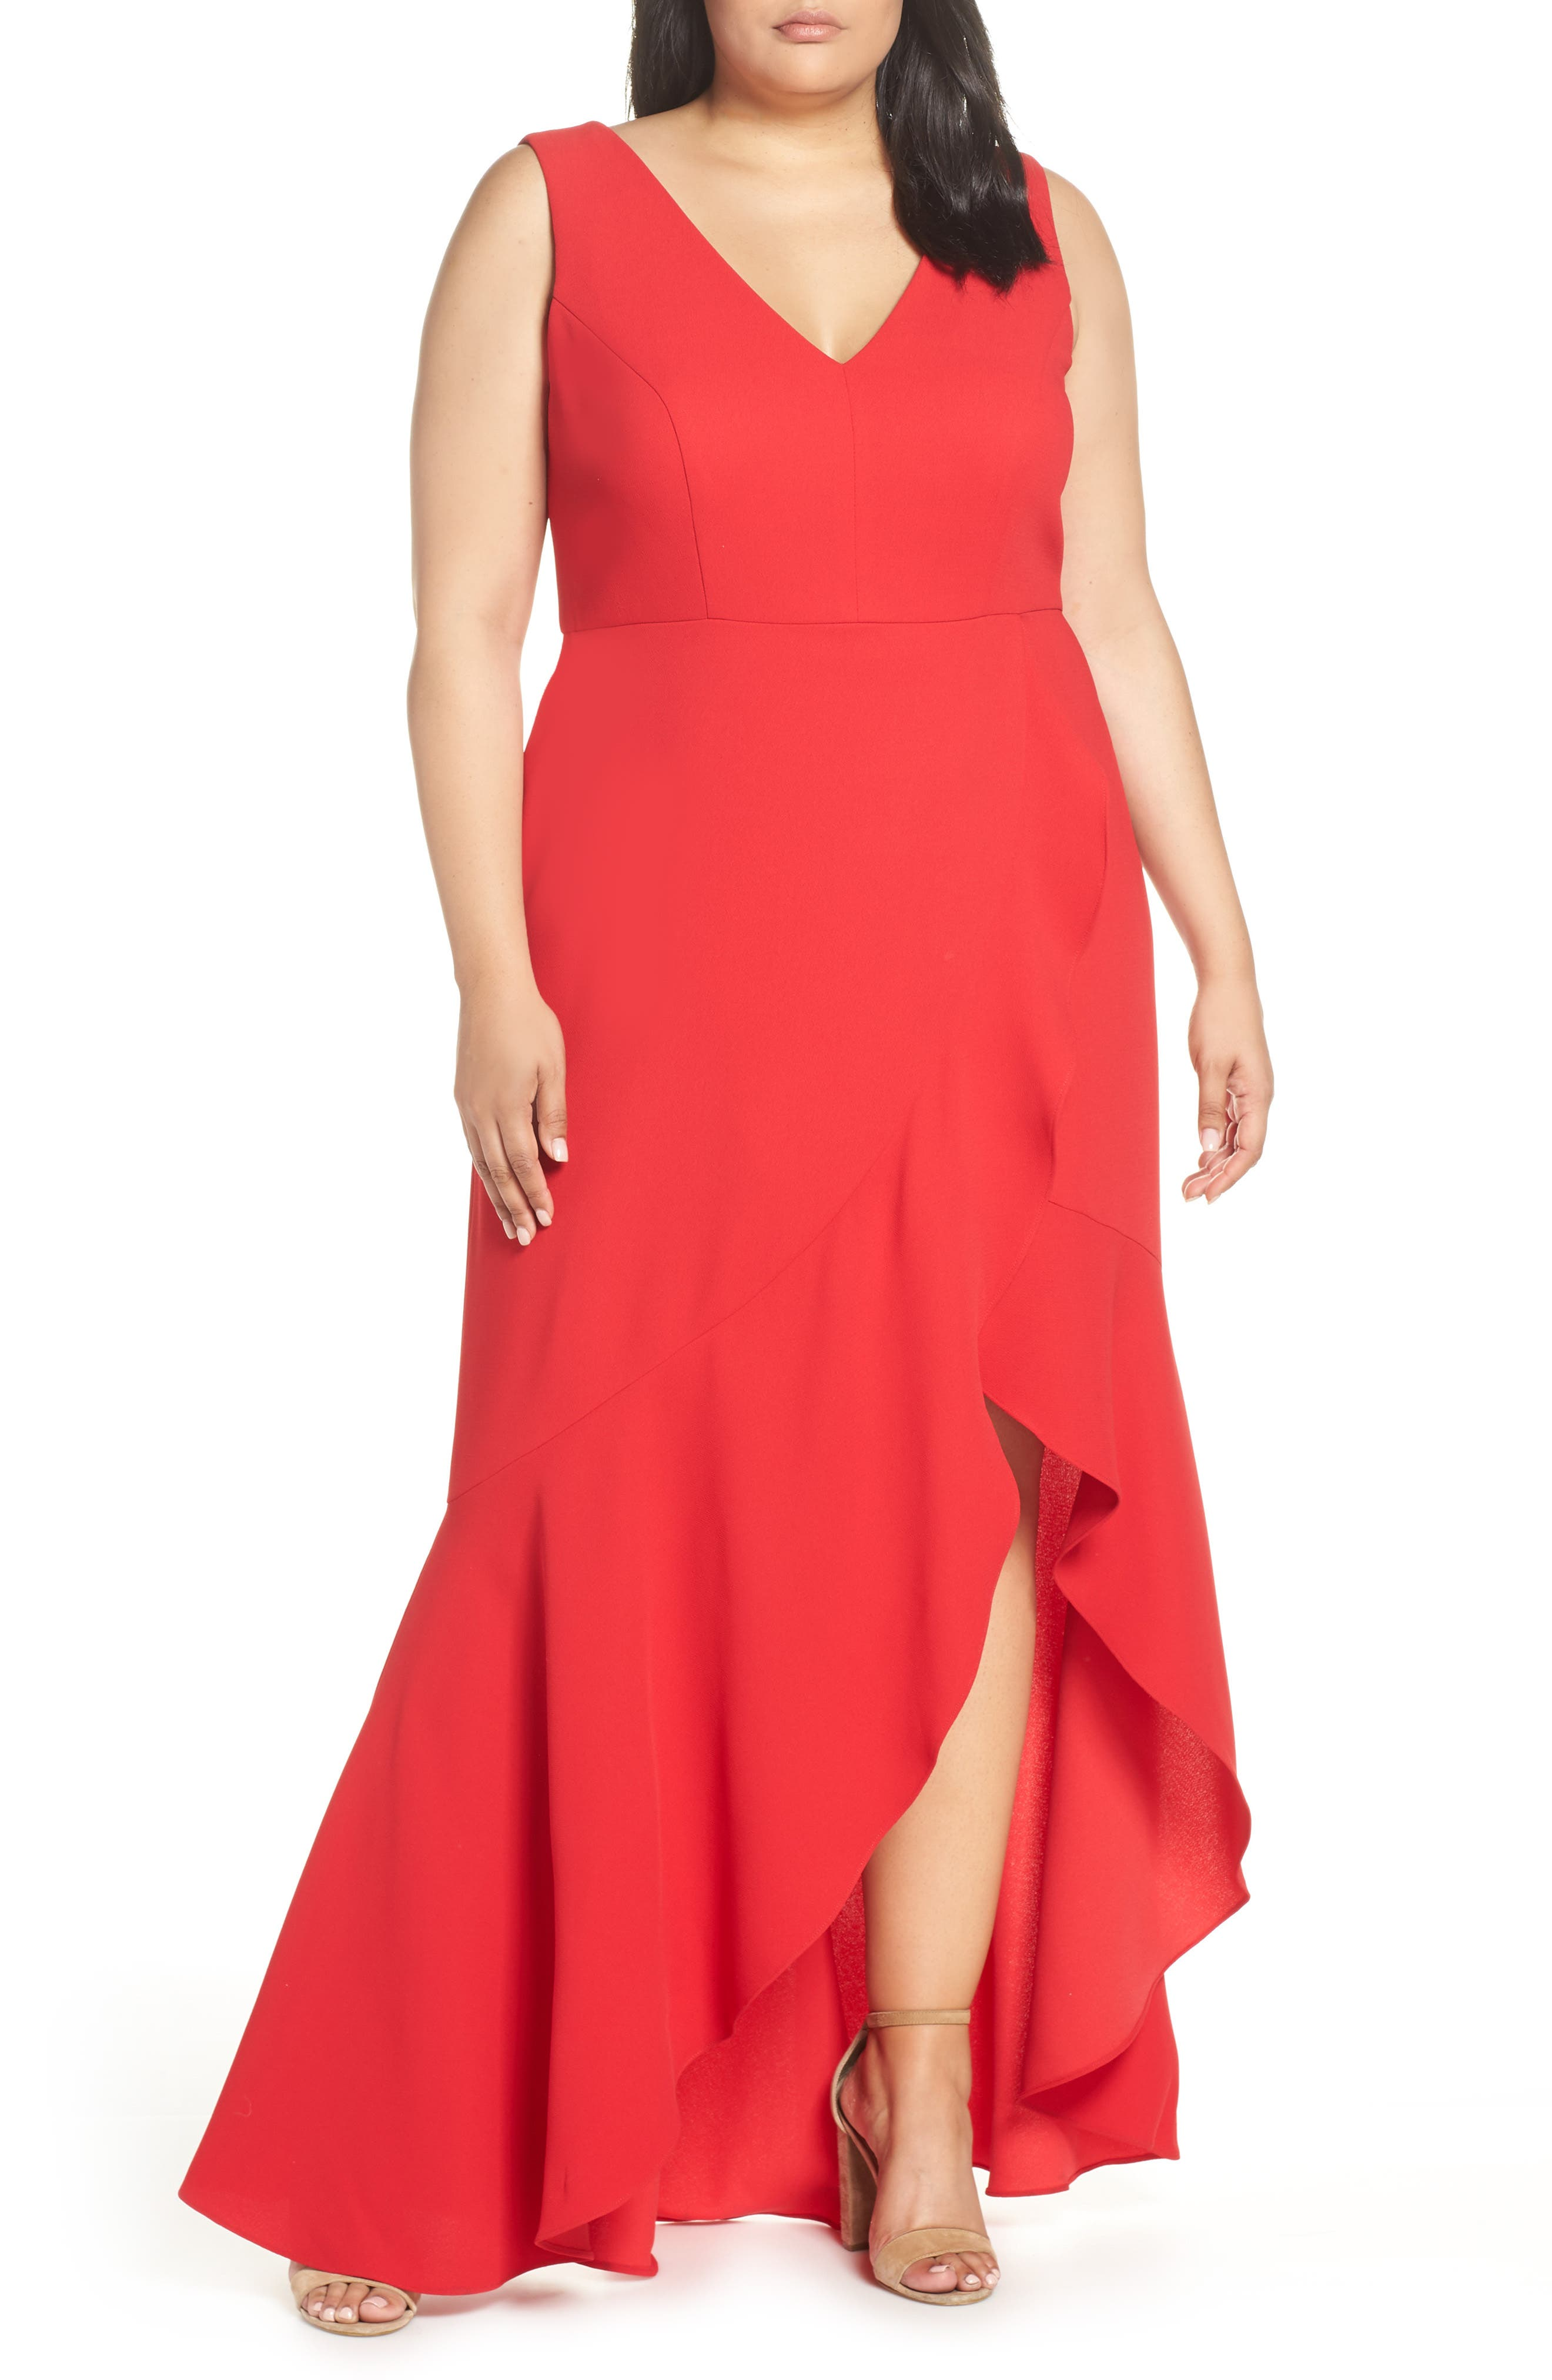 Xscape Red Dresses